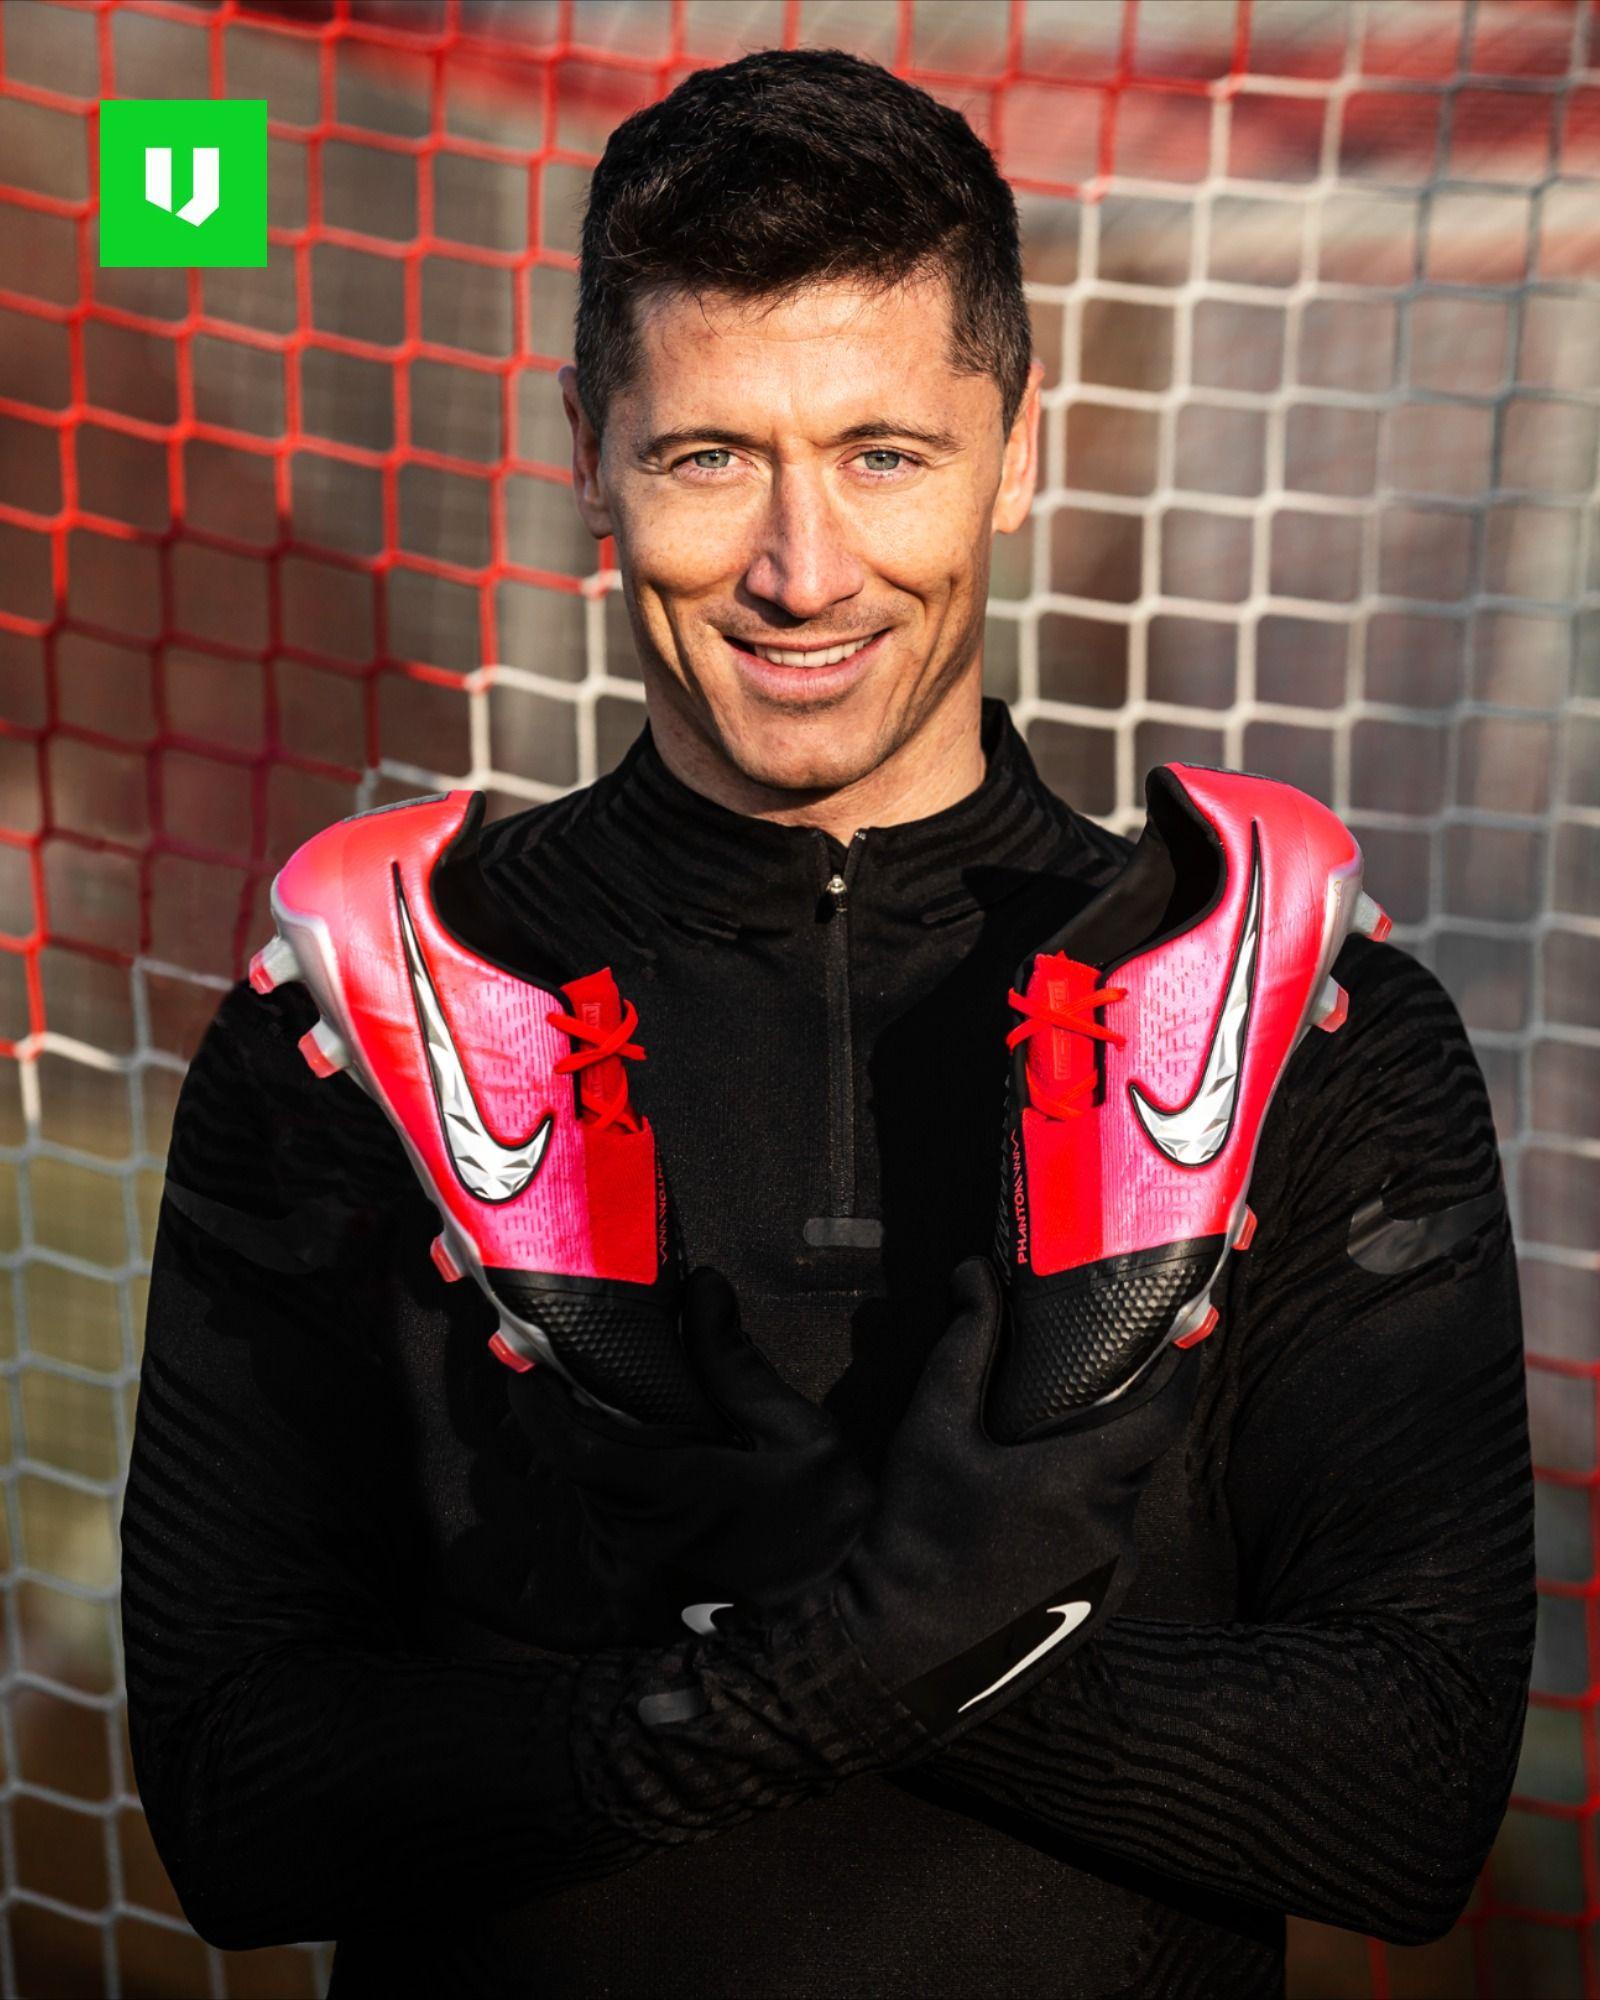 robert lewandowski football boots